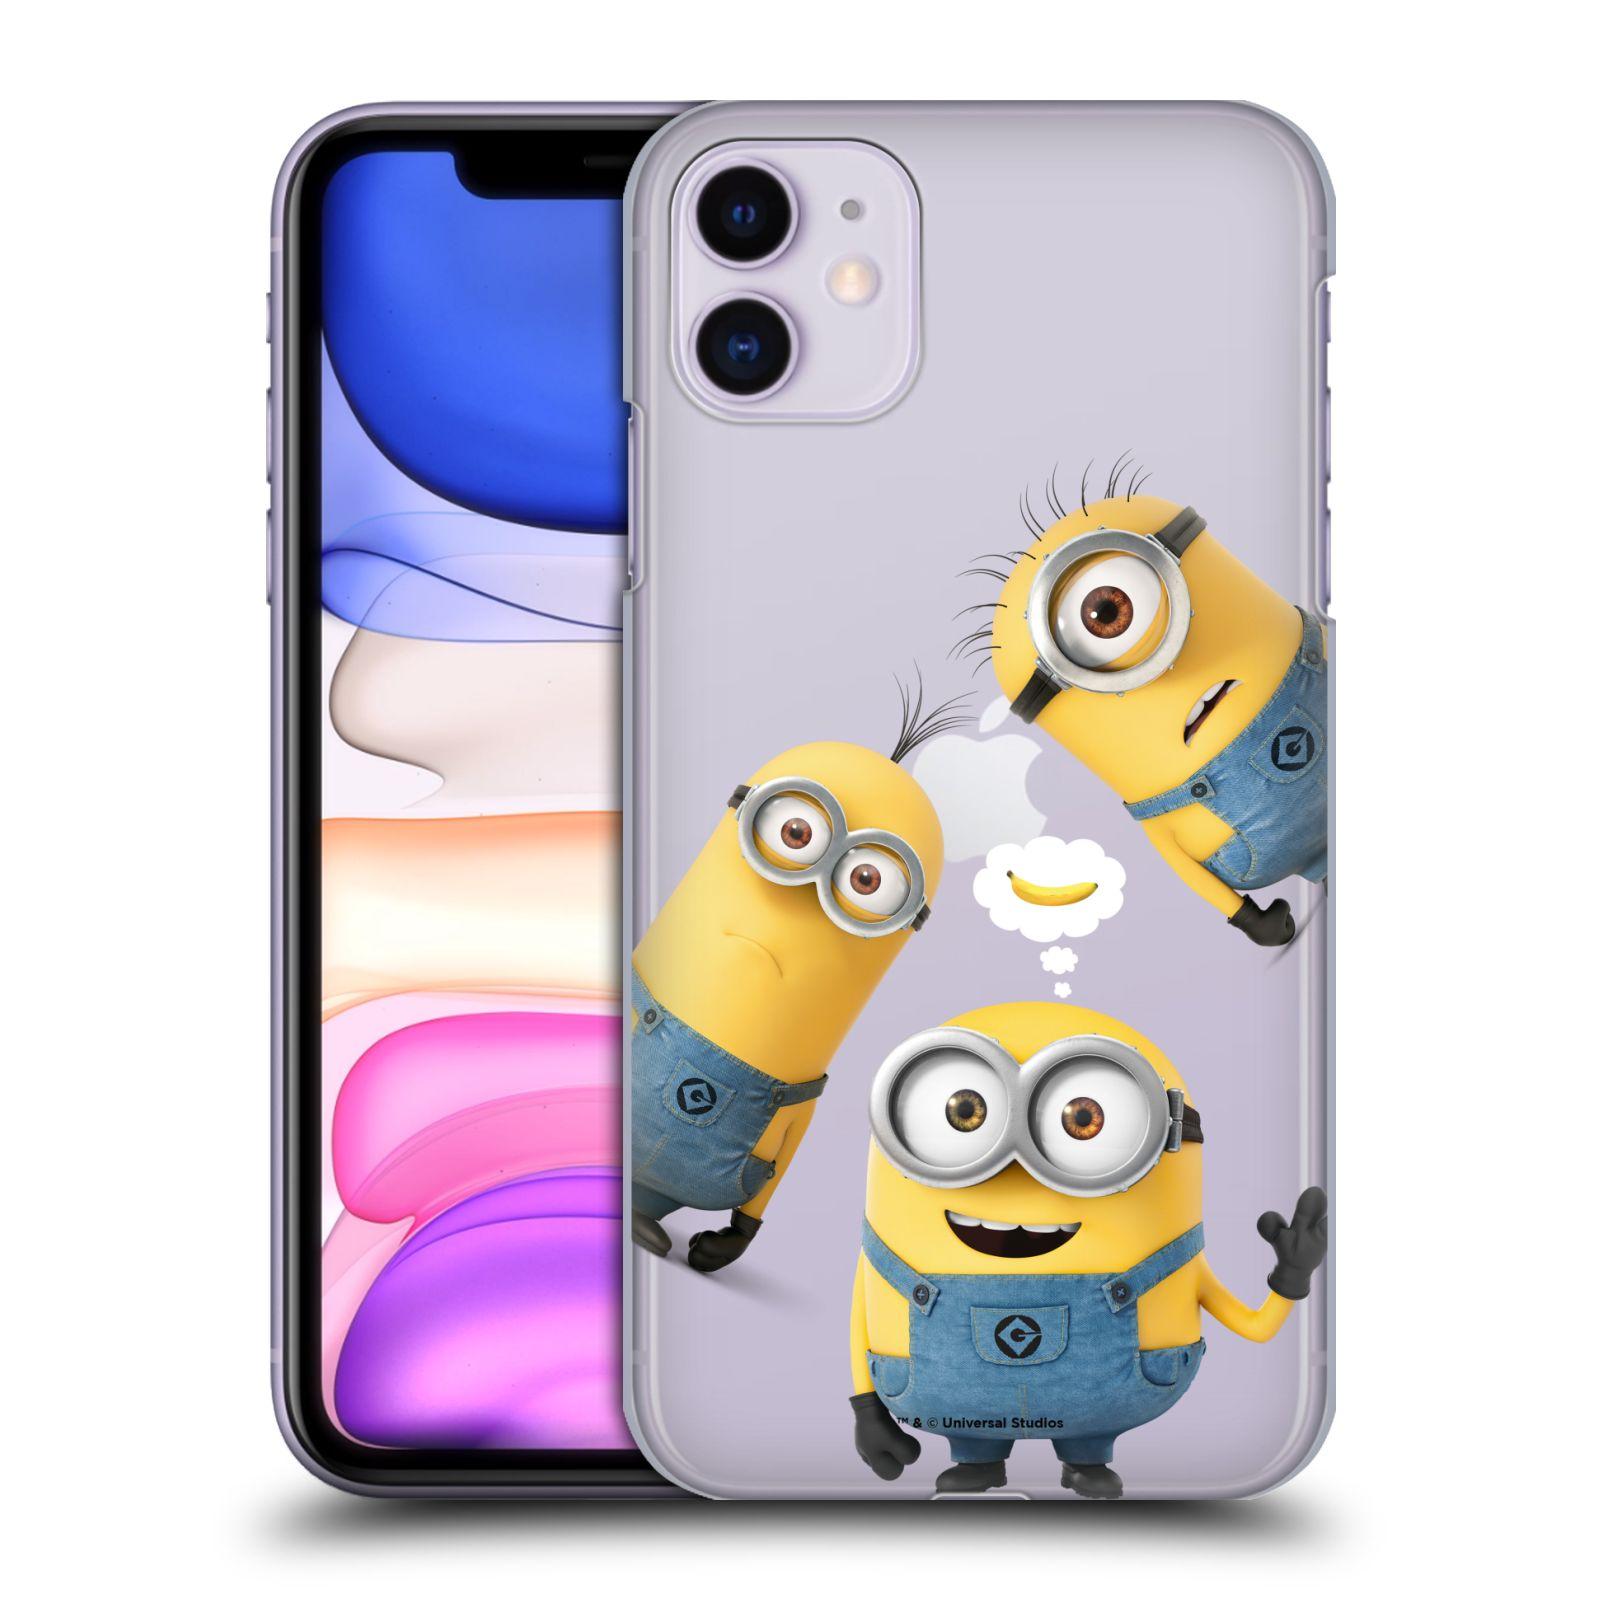 Plastové pouzdro na mobil Apple iPhone 11 - Head Case - Mimoni Banana z filmu Já, padouch - Despicable Me